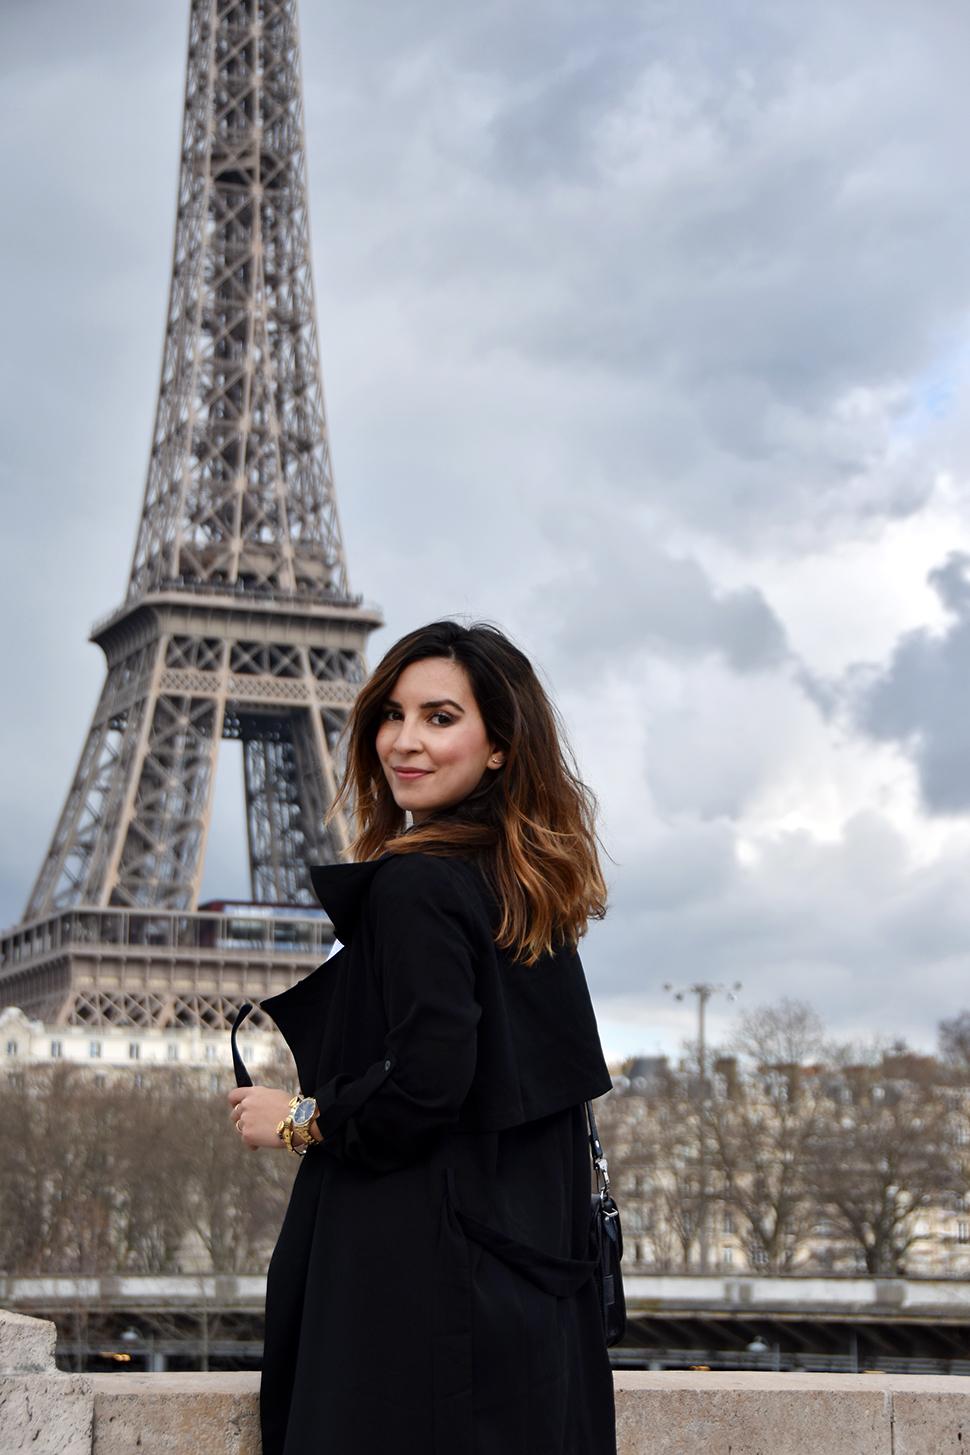 Helloitsvalentine_BirHakeim_Paris_11